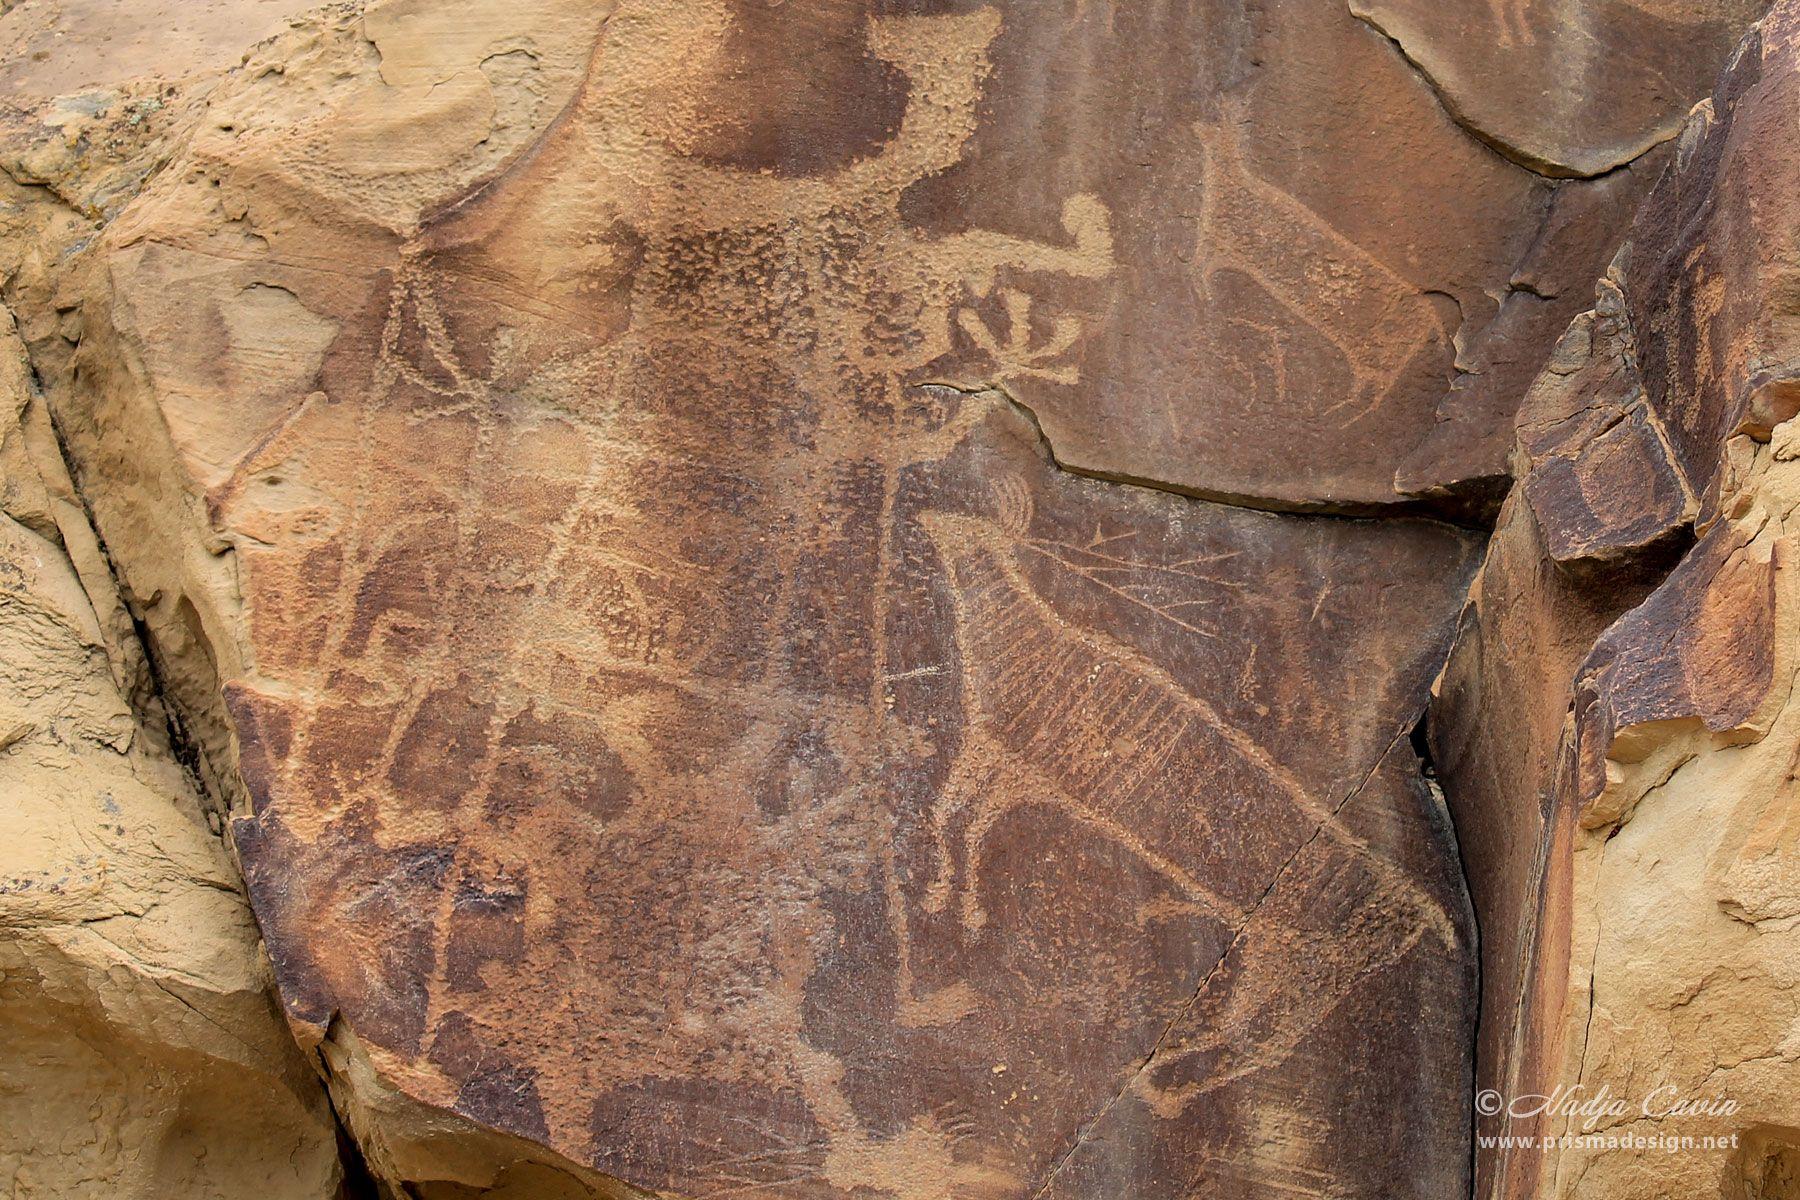 Legend Rock Petroglyph Site wyoparks.state.wy.us Approx. 23 miles ...